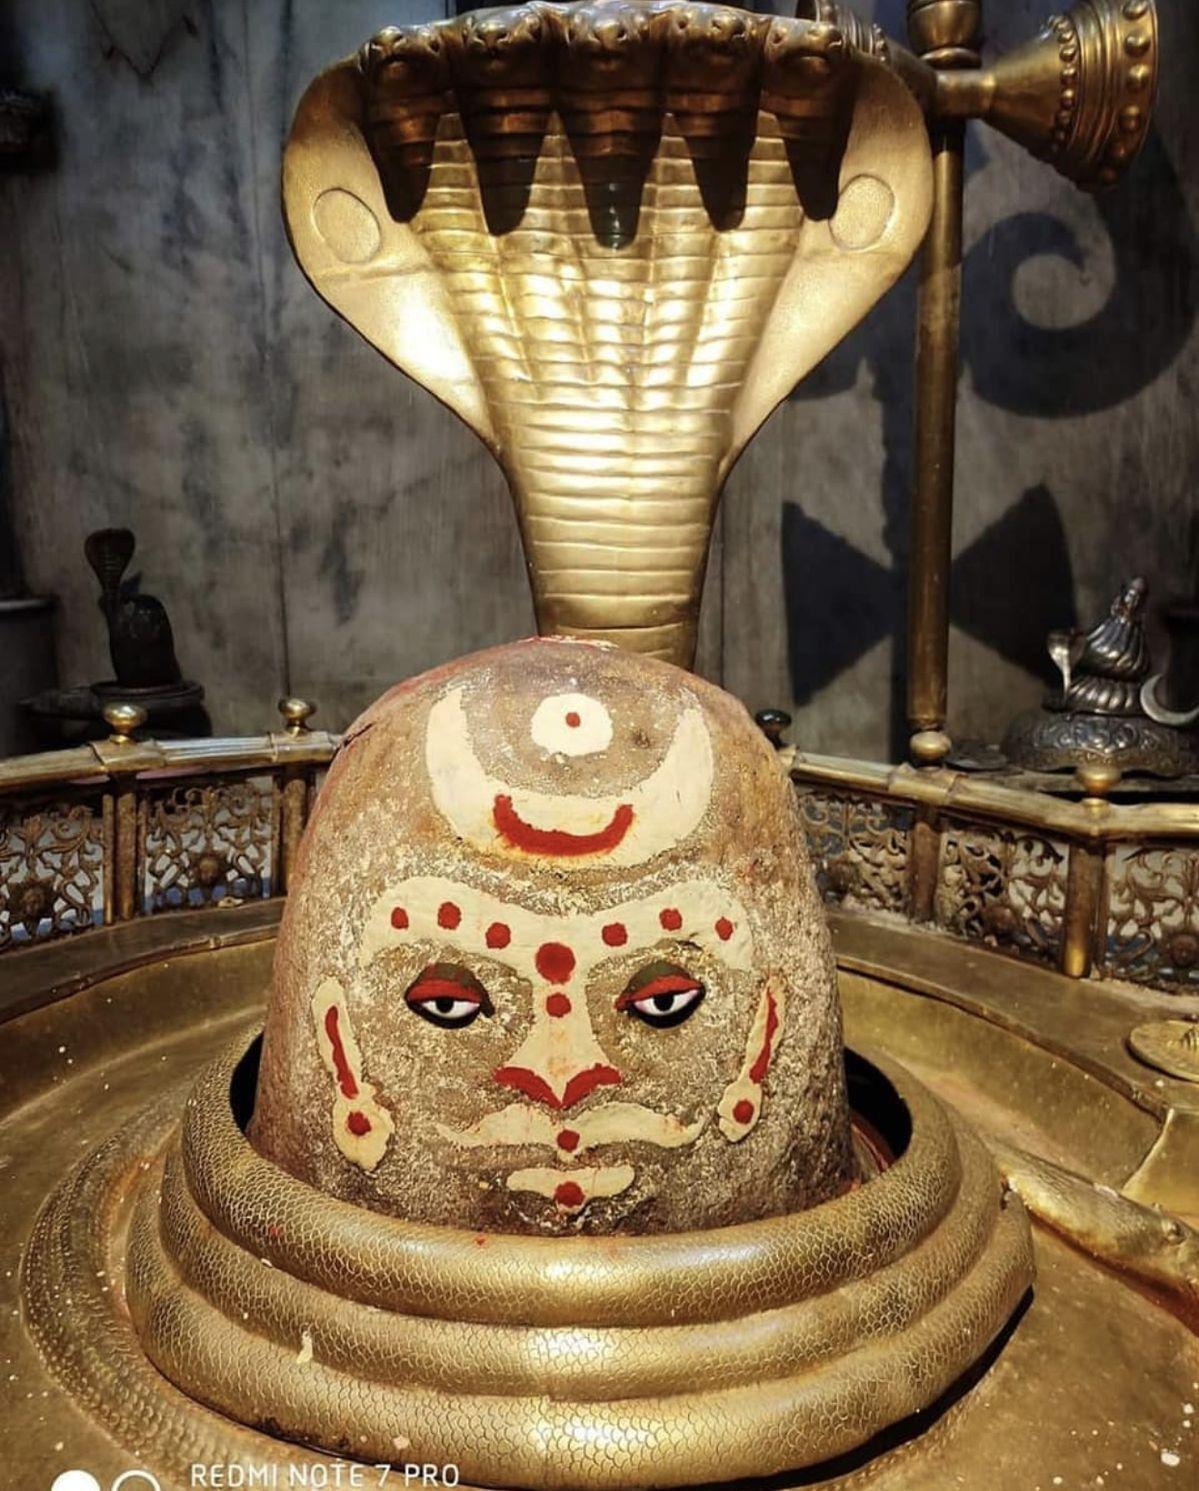 Pin by seema yadav on Shiva in 2020 Kali shiva, Shiva